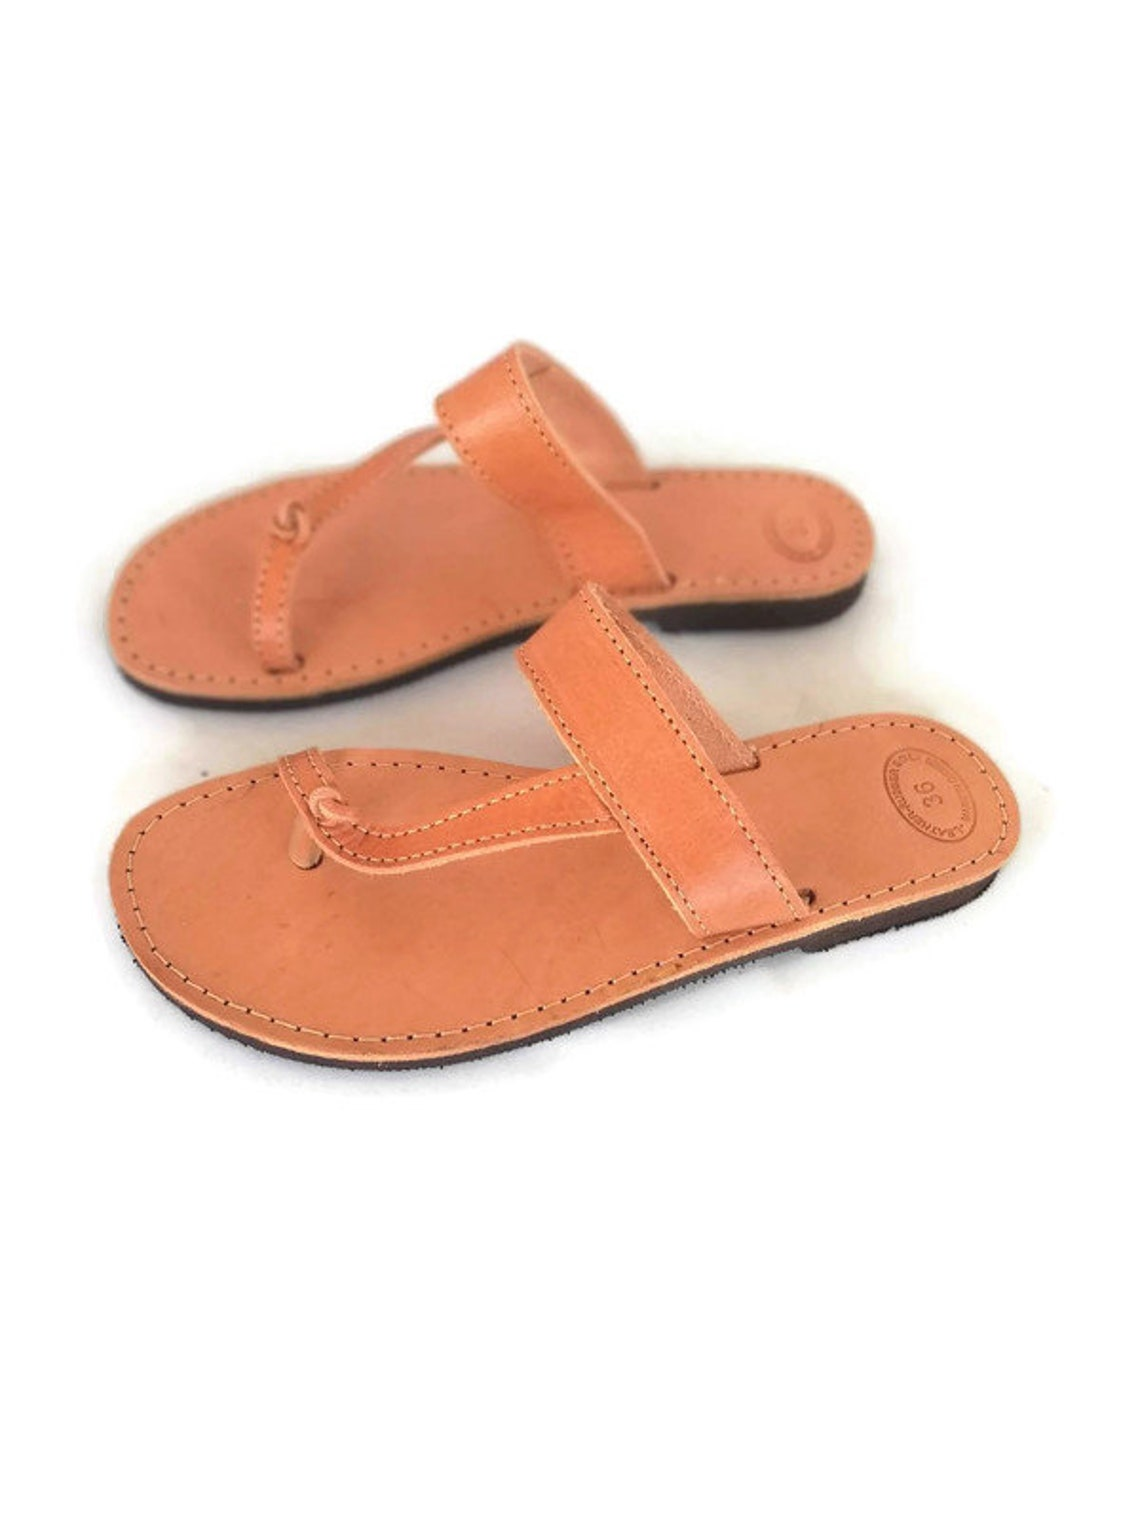 Leather Handmade Greek Sandals - Big Sale 8BZGs